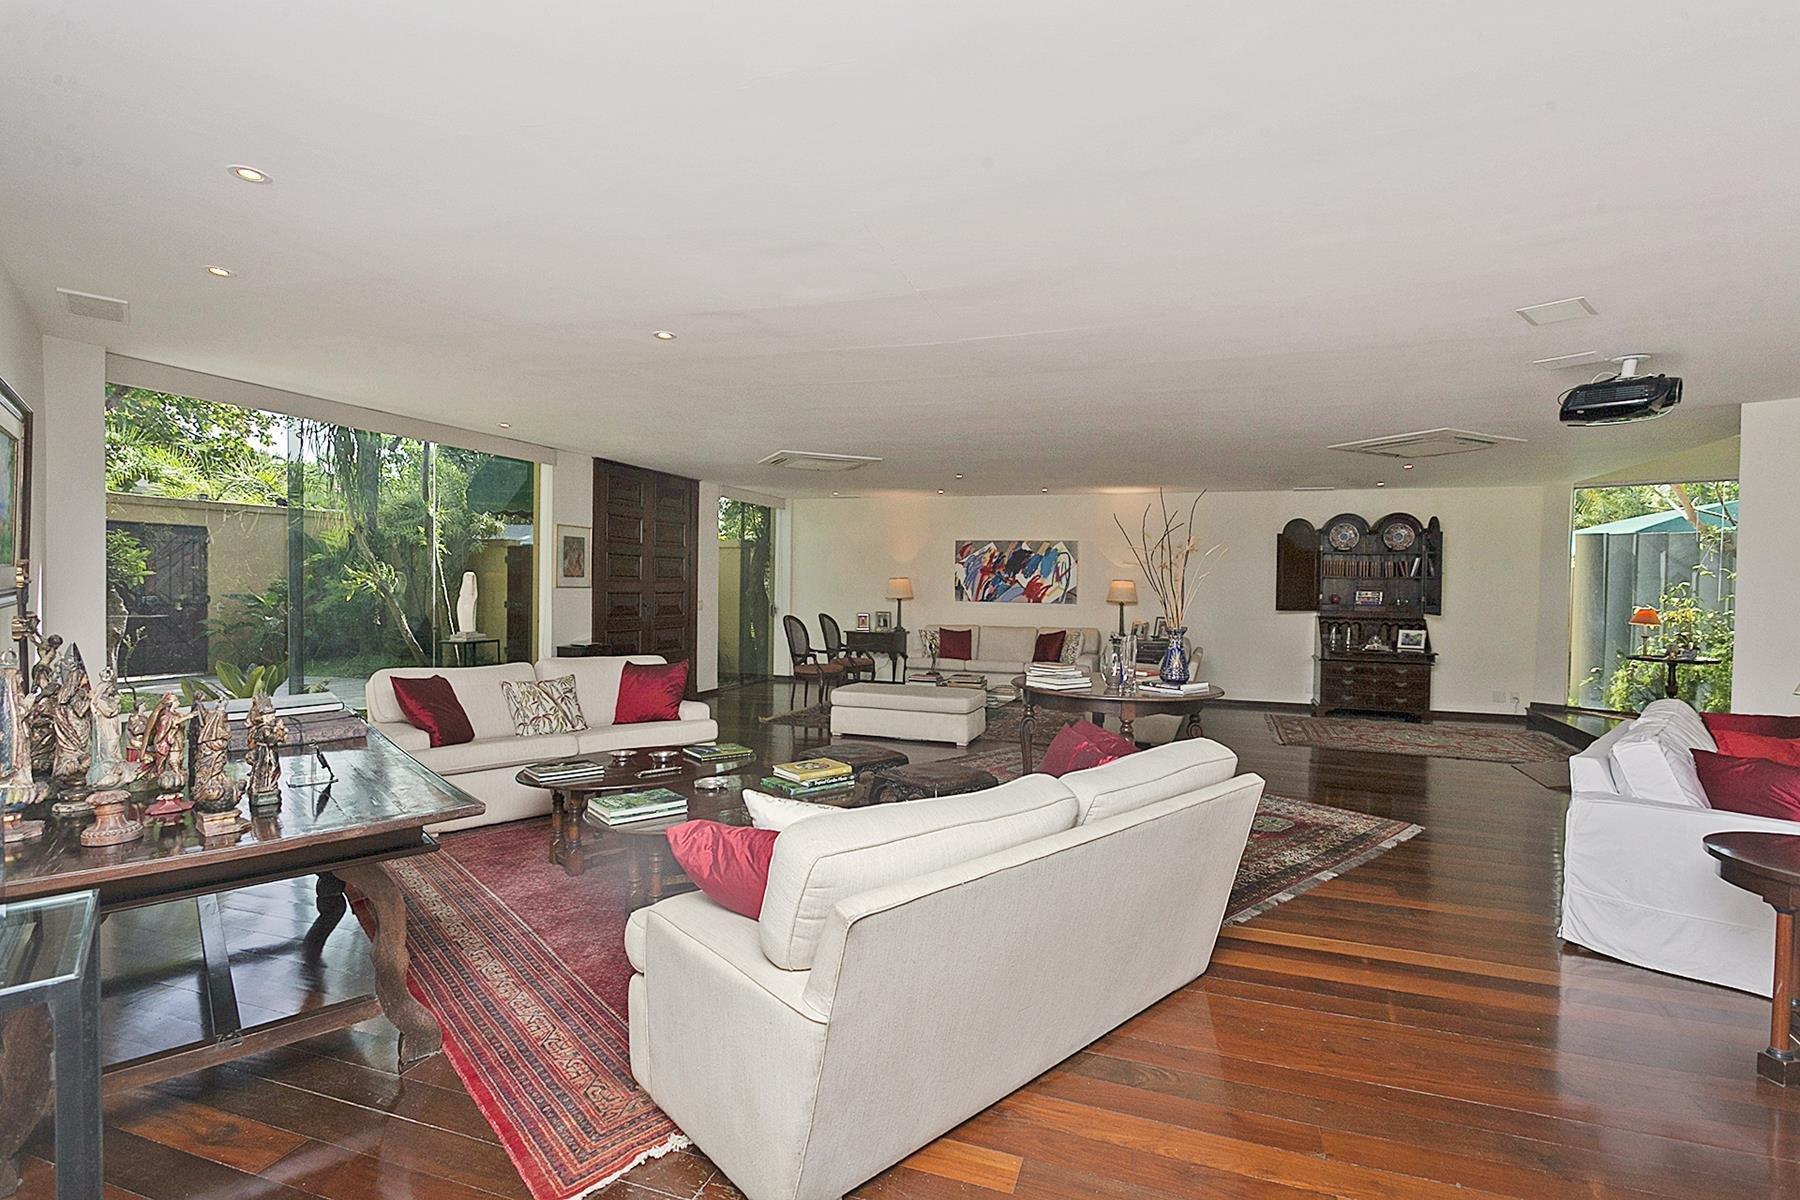 Eigentumswohnung in Barra da Tijuca, Rio de Janeiro, Brasilien 1